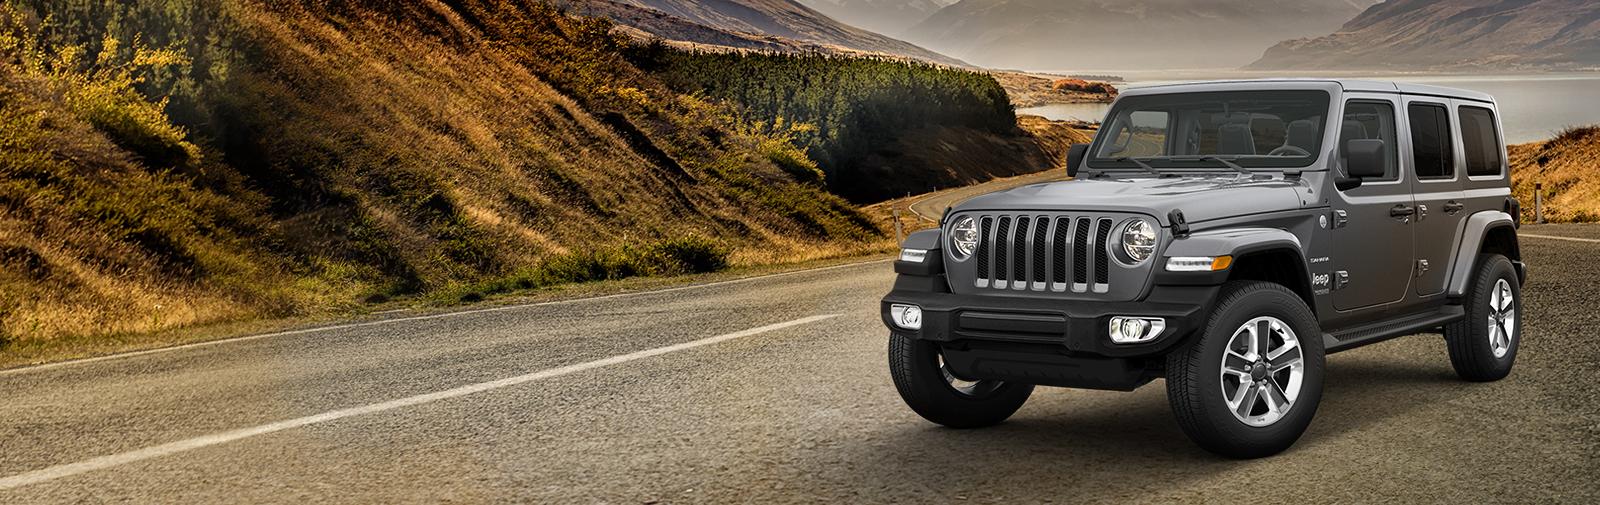 jeep-wrangler-réunion